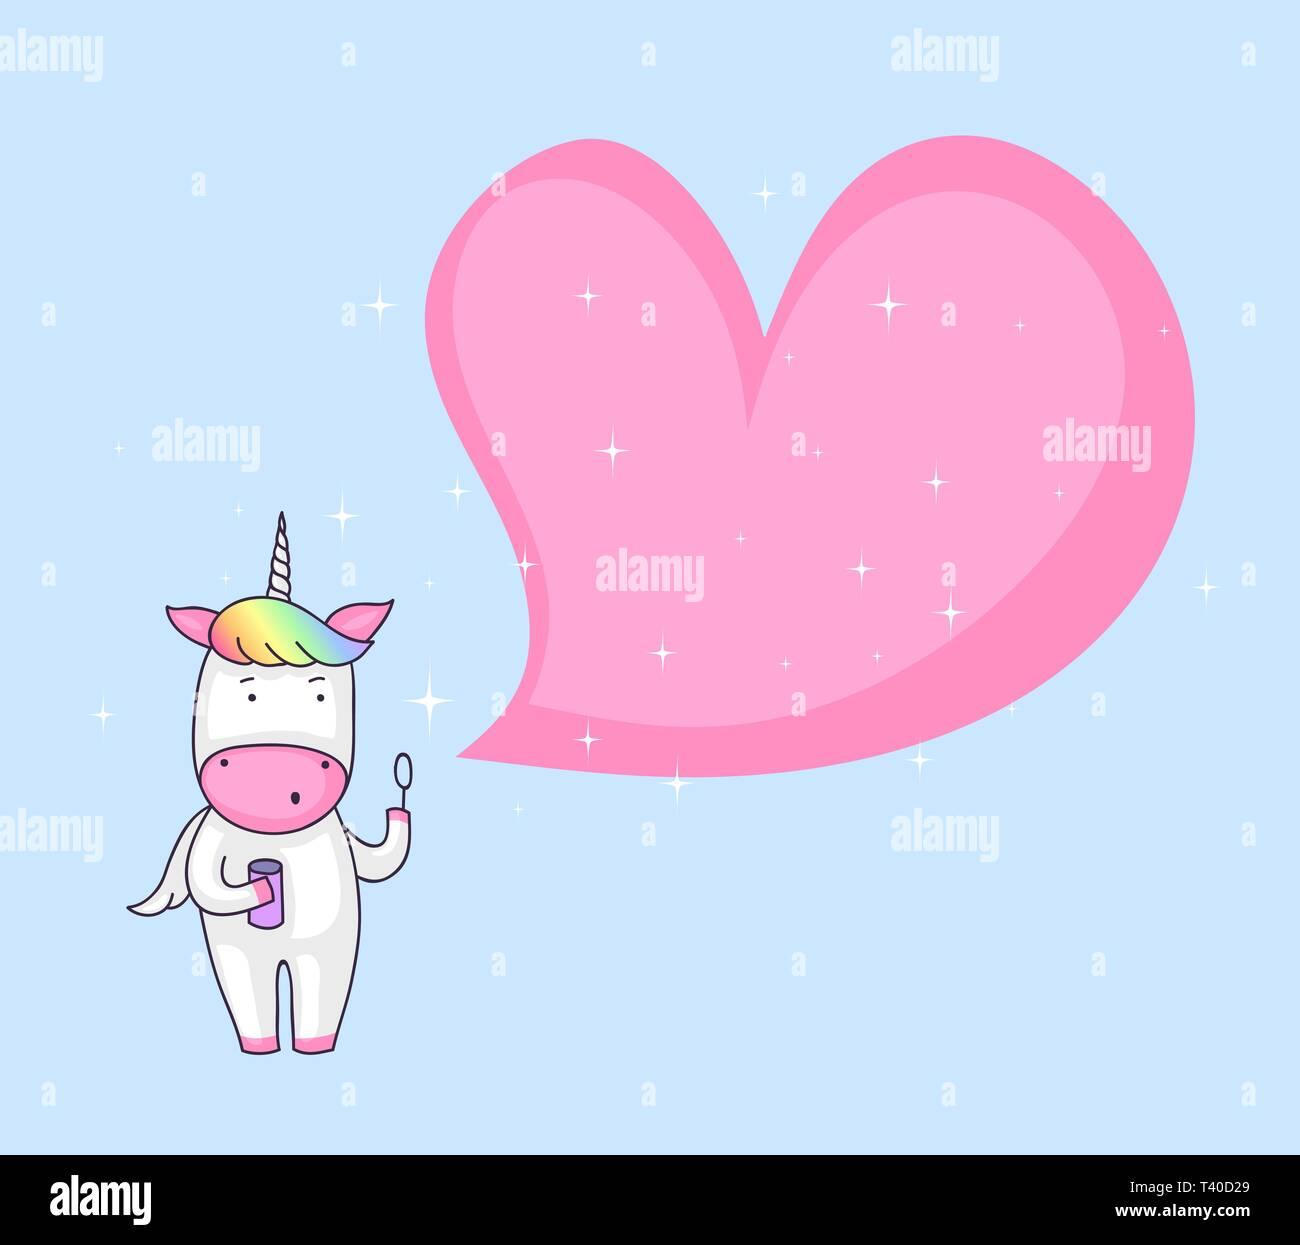 Cute cartoon of a unicorn blowing a heart shaped soap bubble - Stock Vector